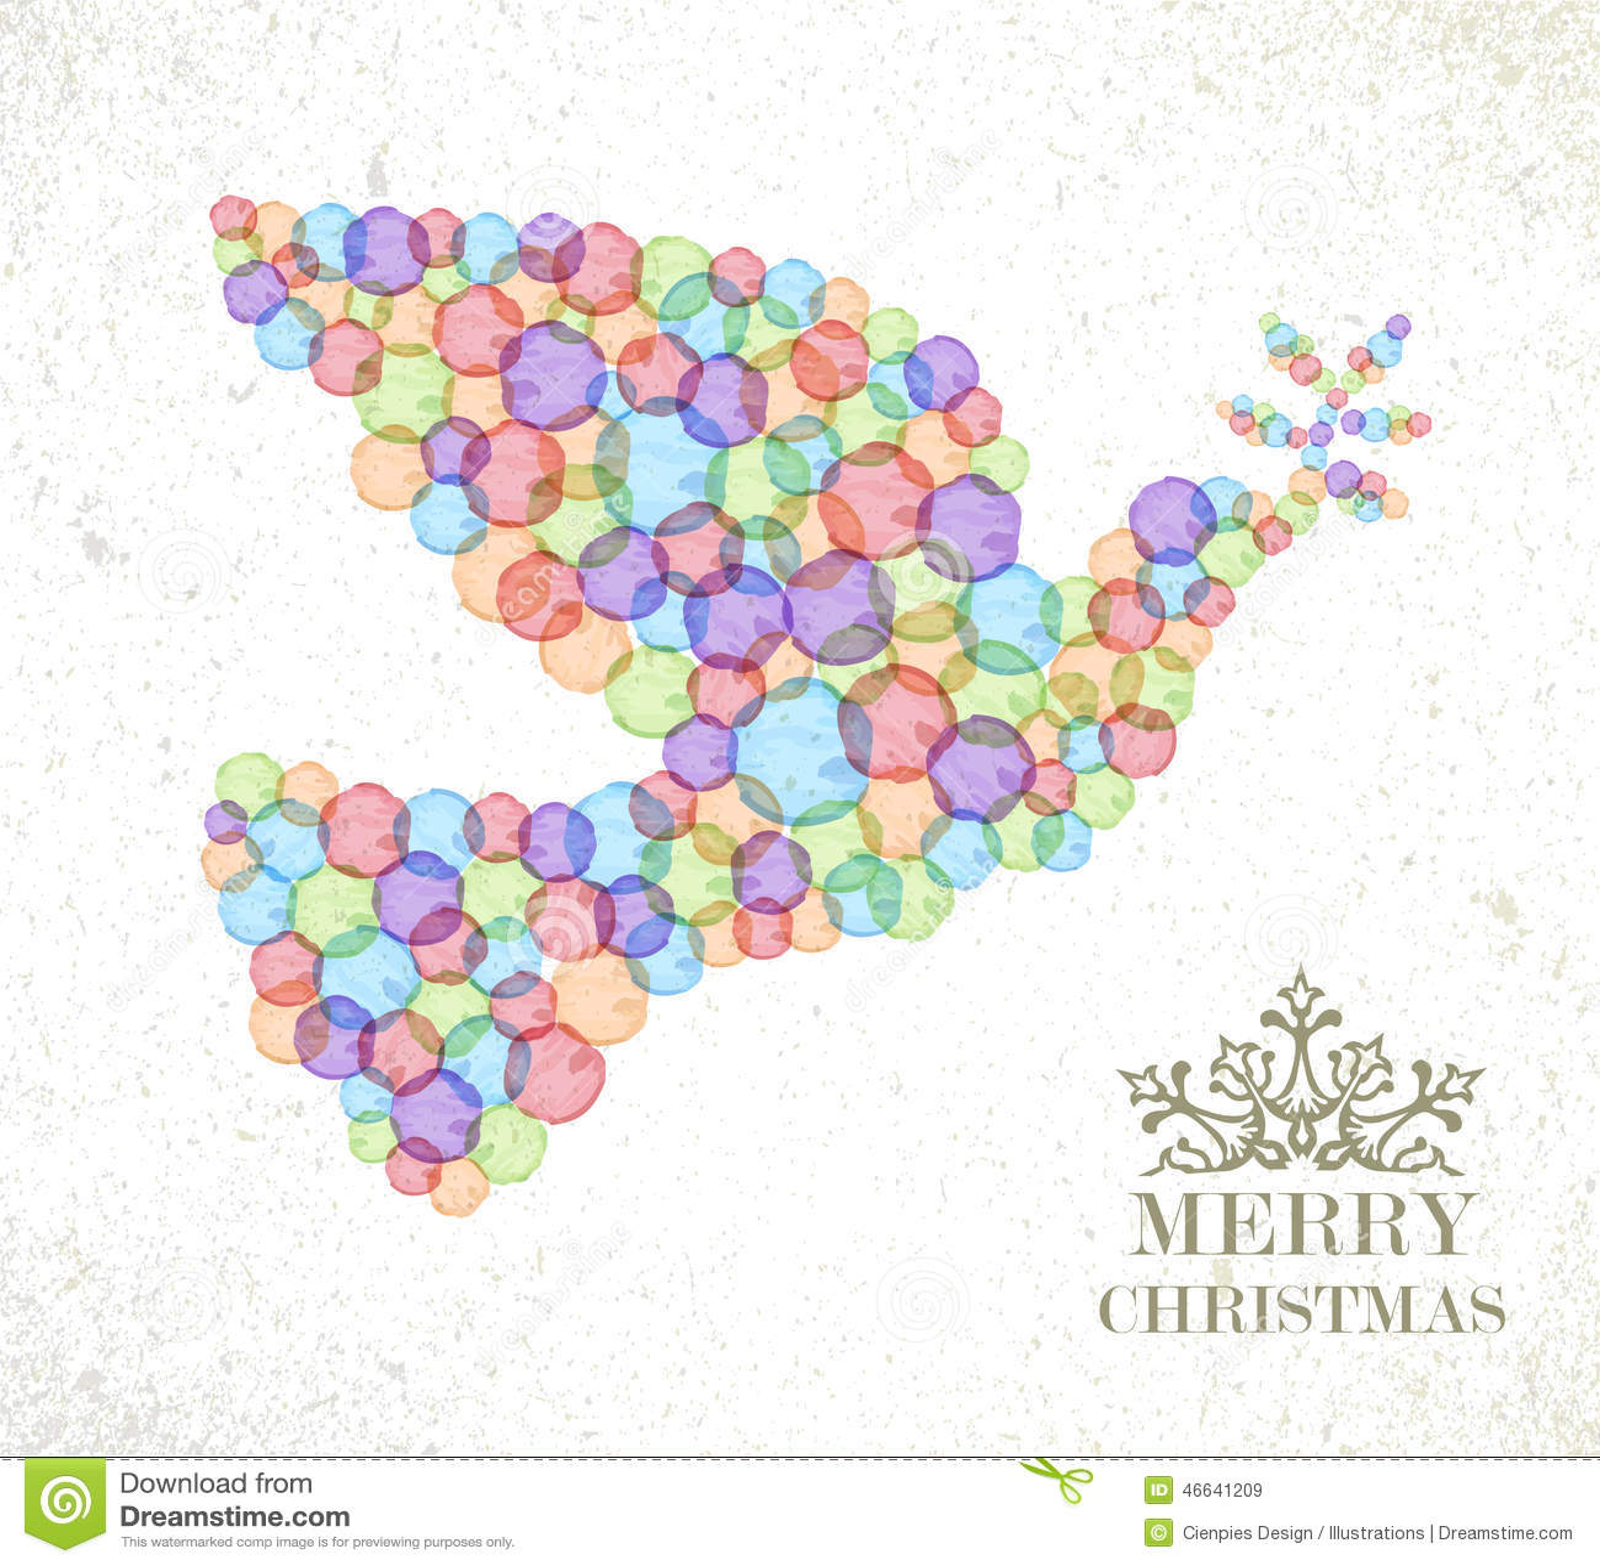 Merry Christmas Watercolor Spot Peace Dove Stock Vector